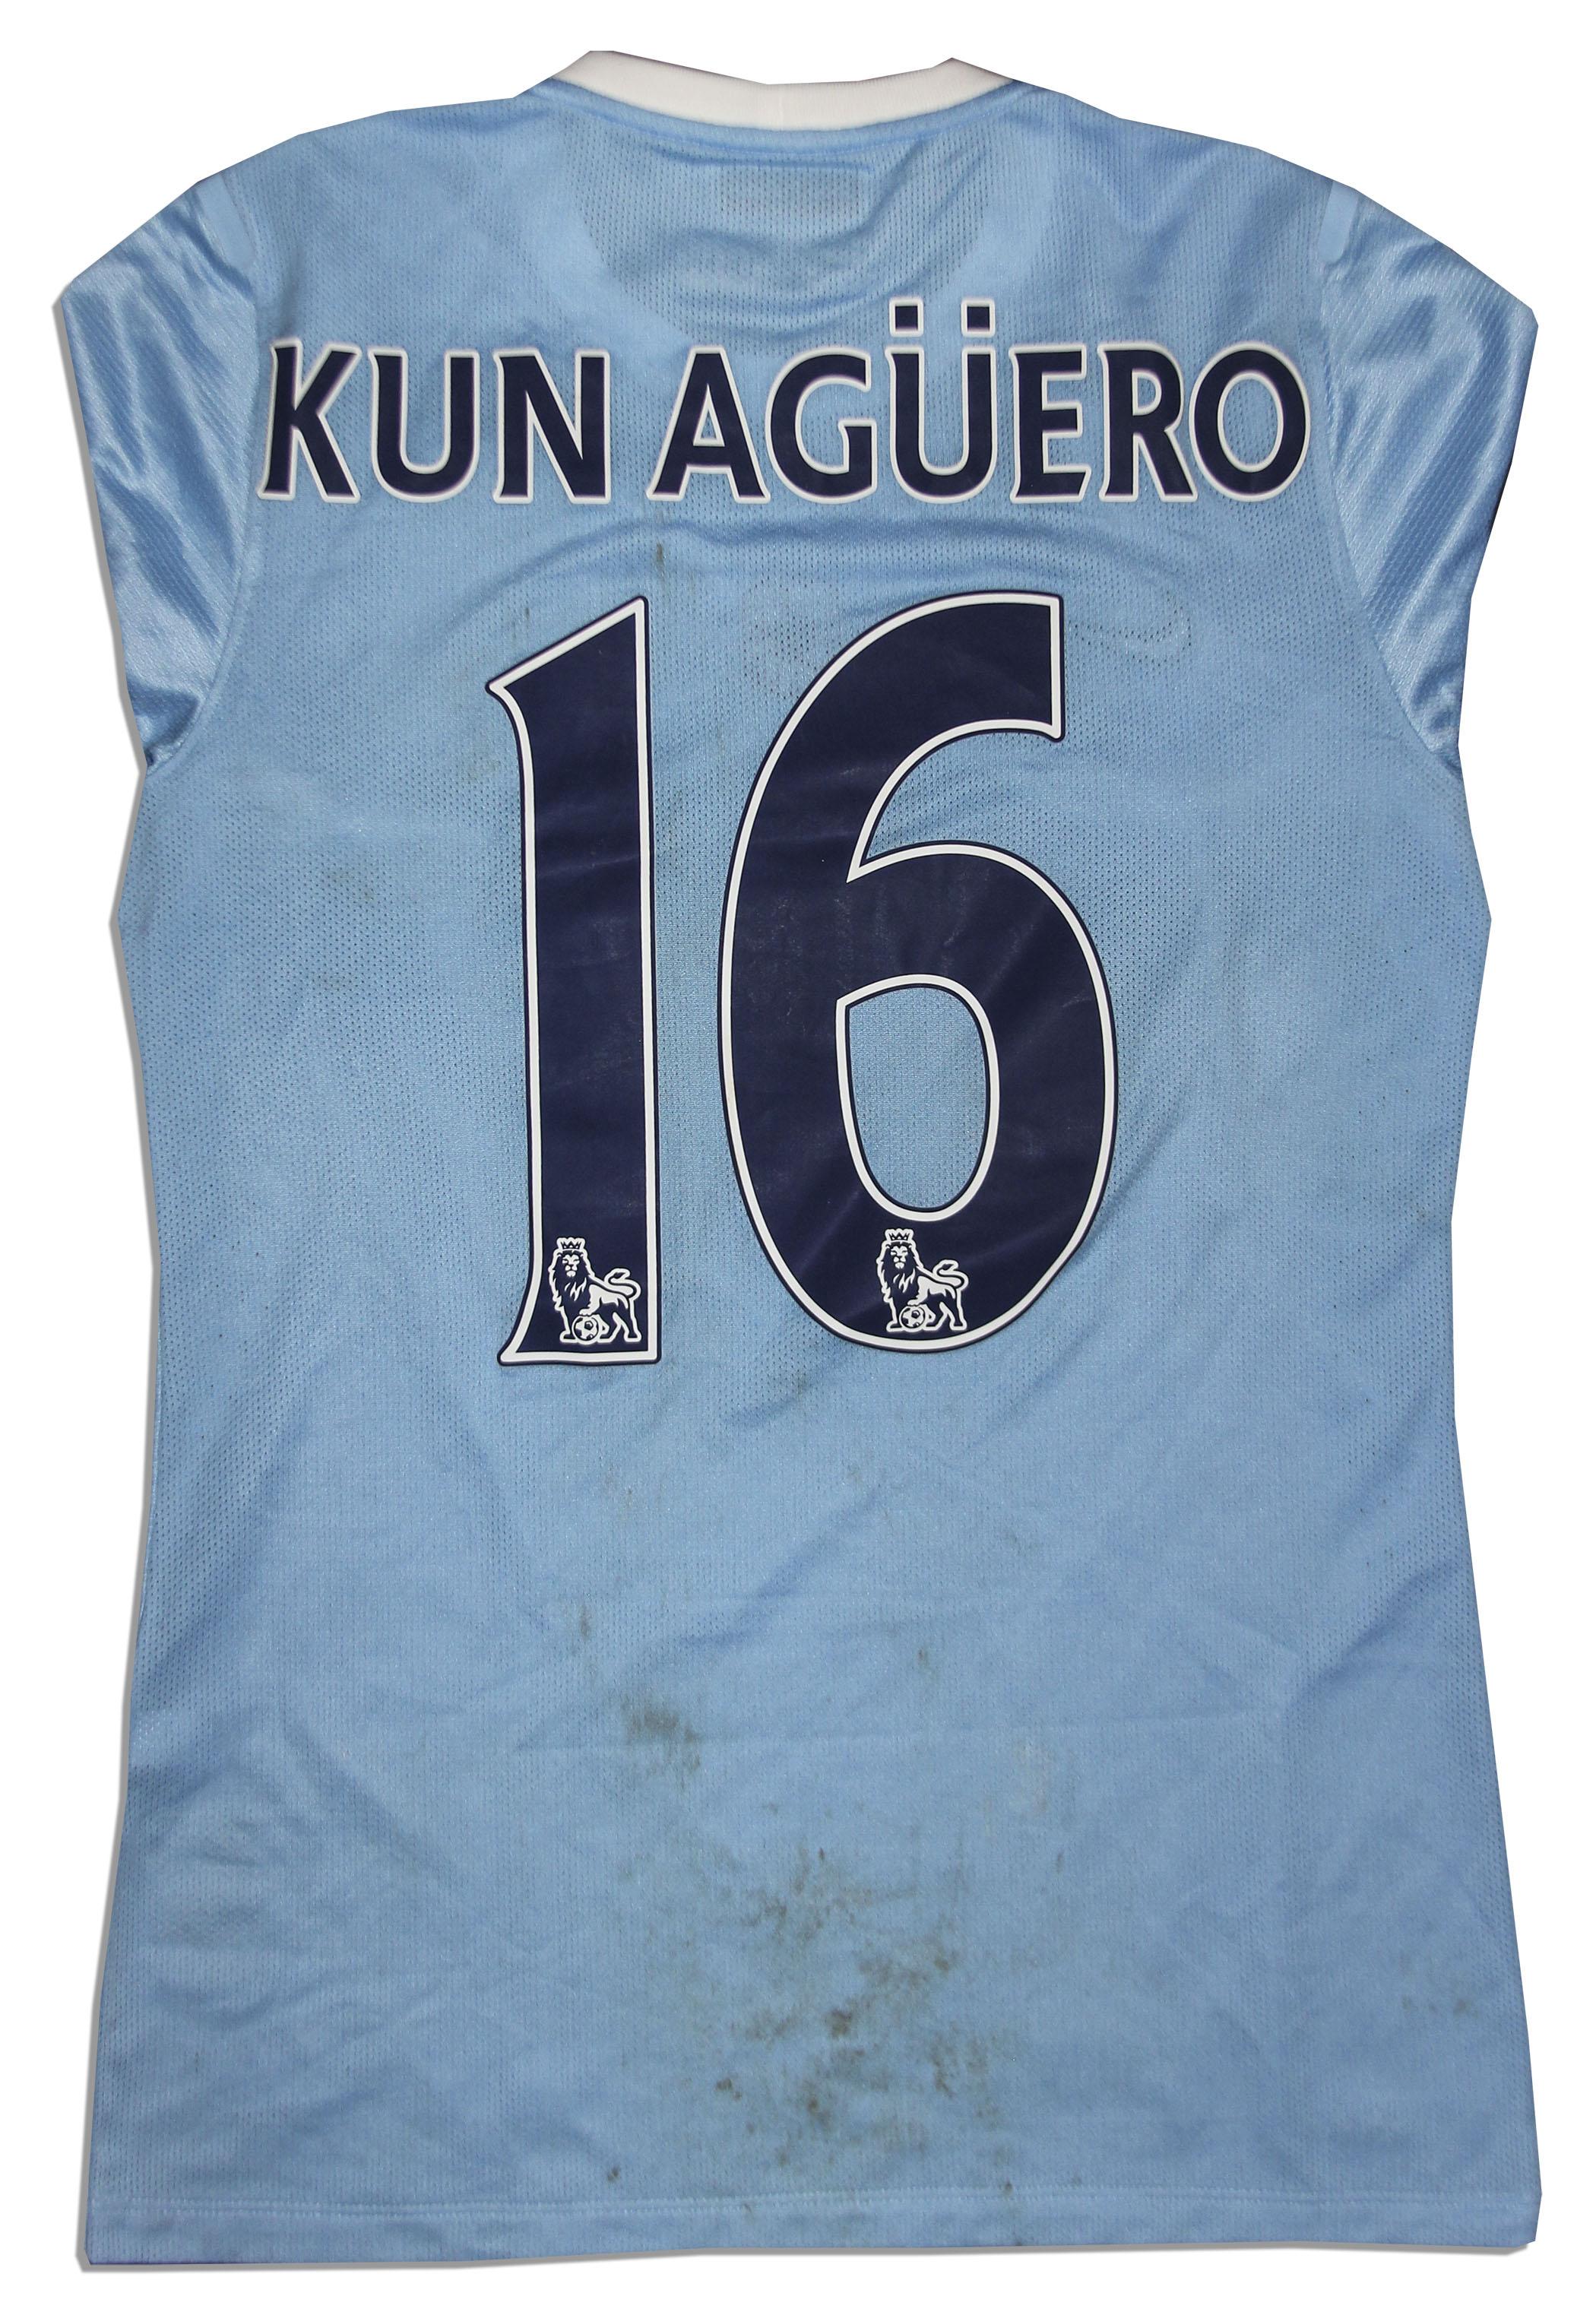 brand new 4c9ad 2ceb2 Lot Detail - Aguero Match Worn Manchester City Shirt Signed